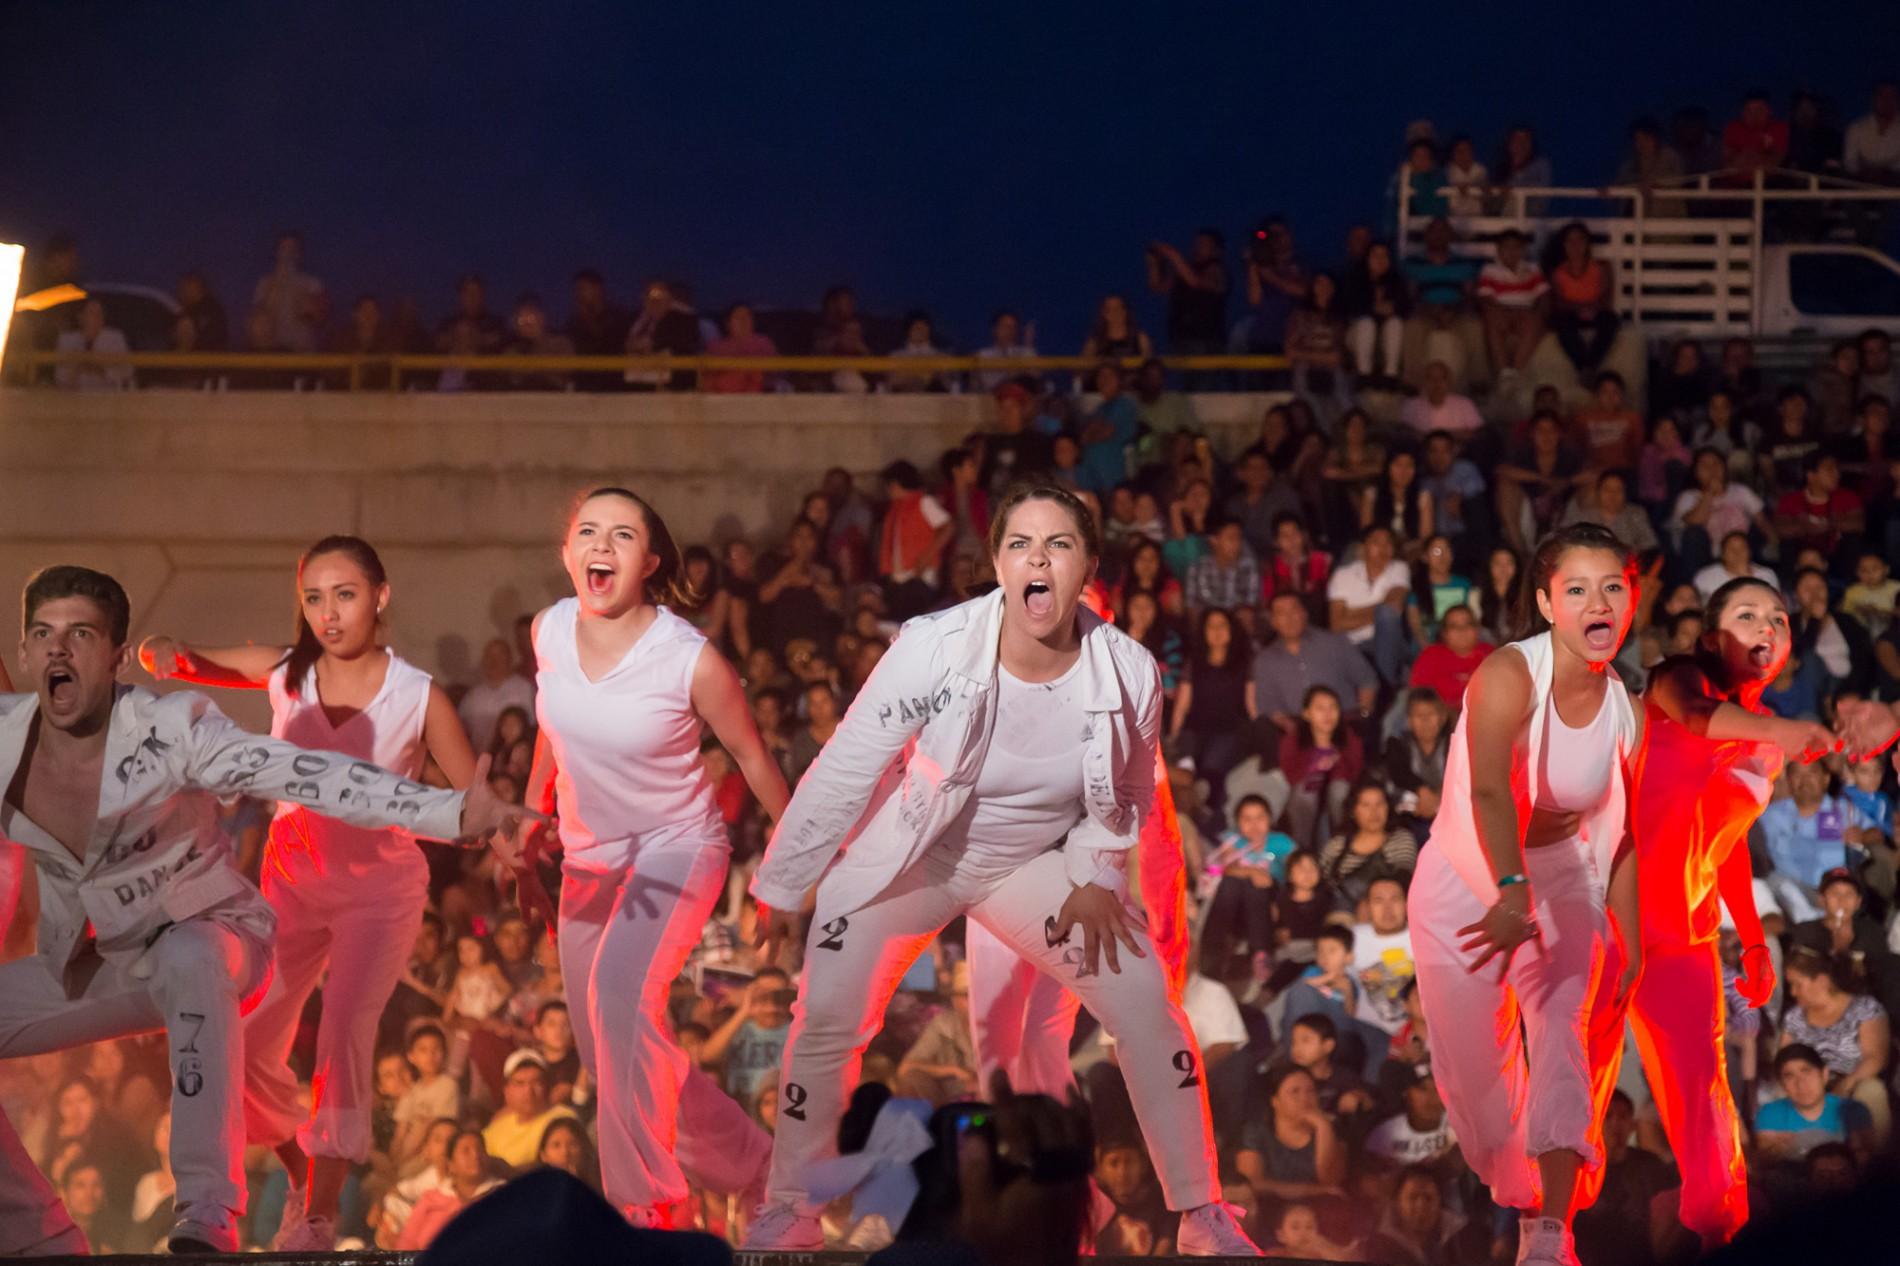 Festival del Desierto, Matehuala, Mexico, PAN.OPTIKUM, human factor, Sandra Ellrath, Matthias Rettner, Sigrun Fritsch